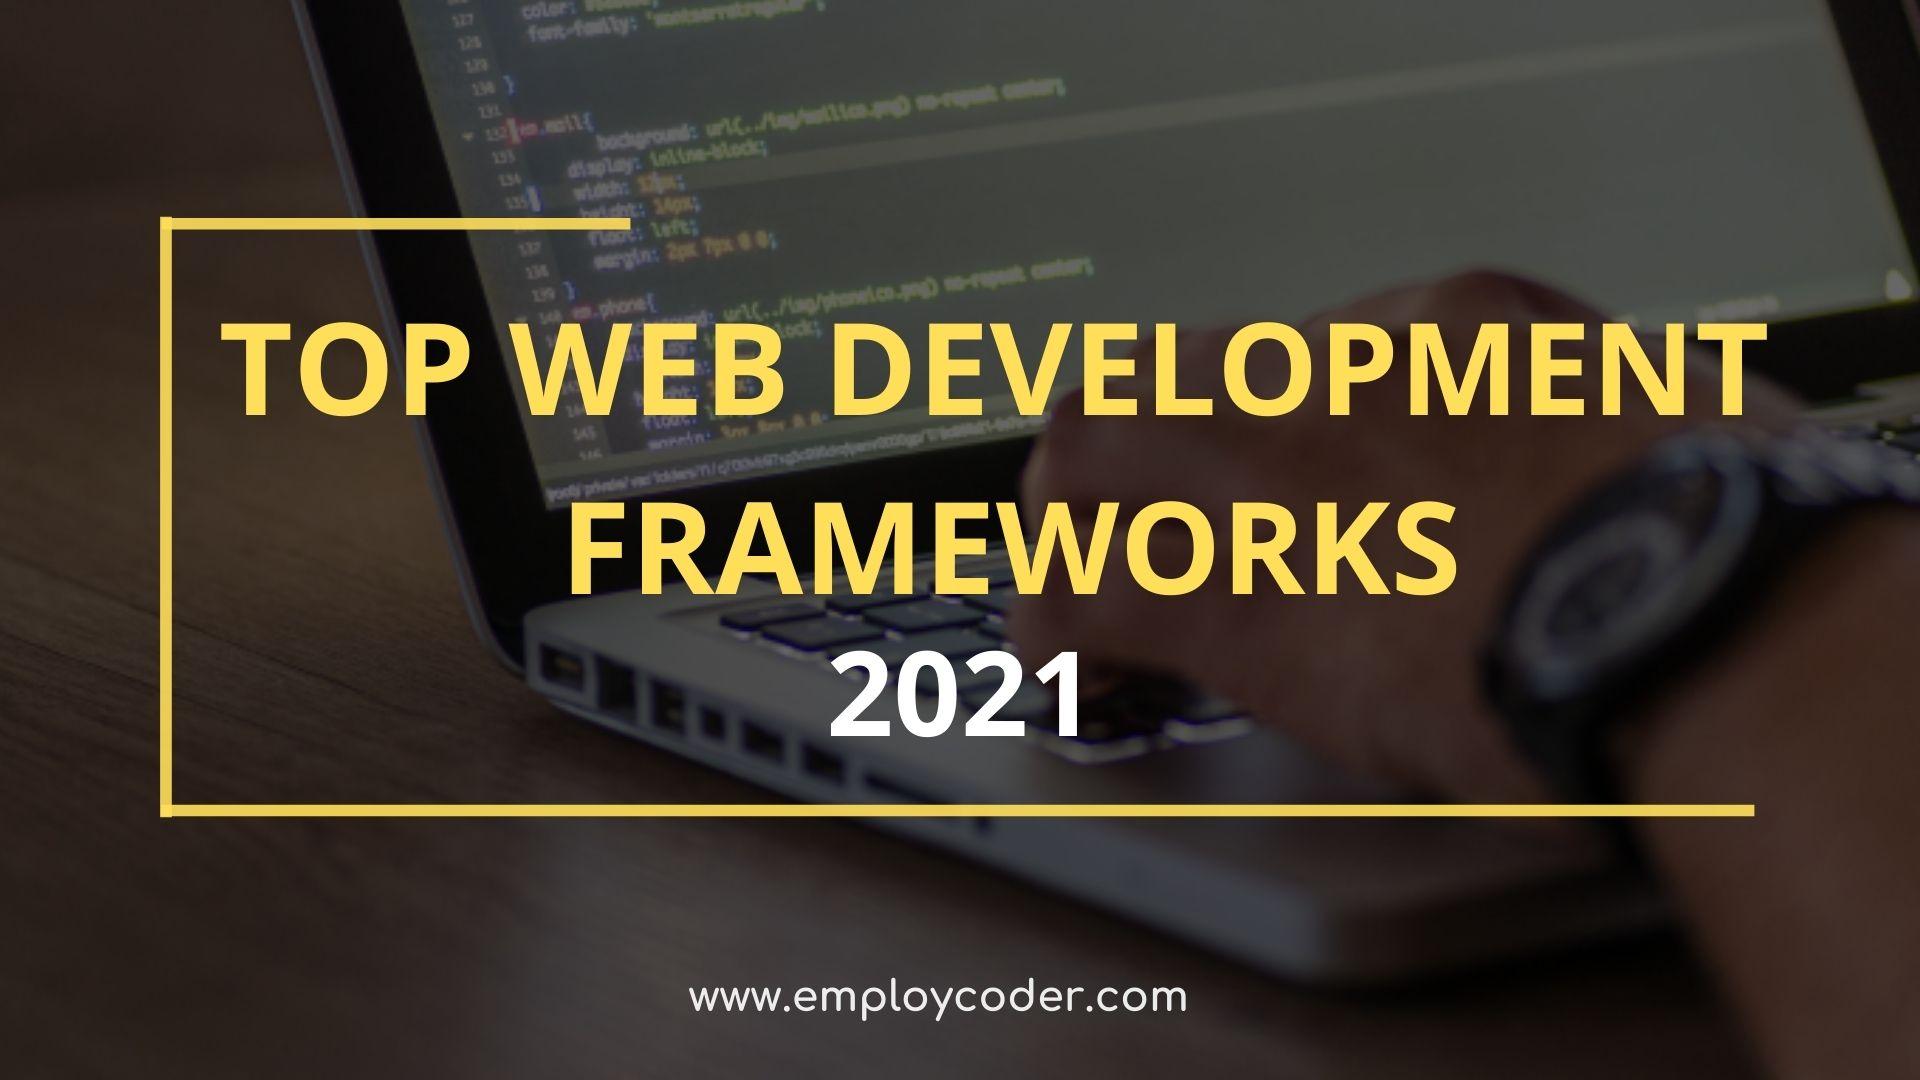 Top Web Development Frameworks in 2021